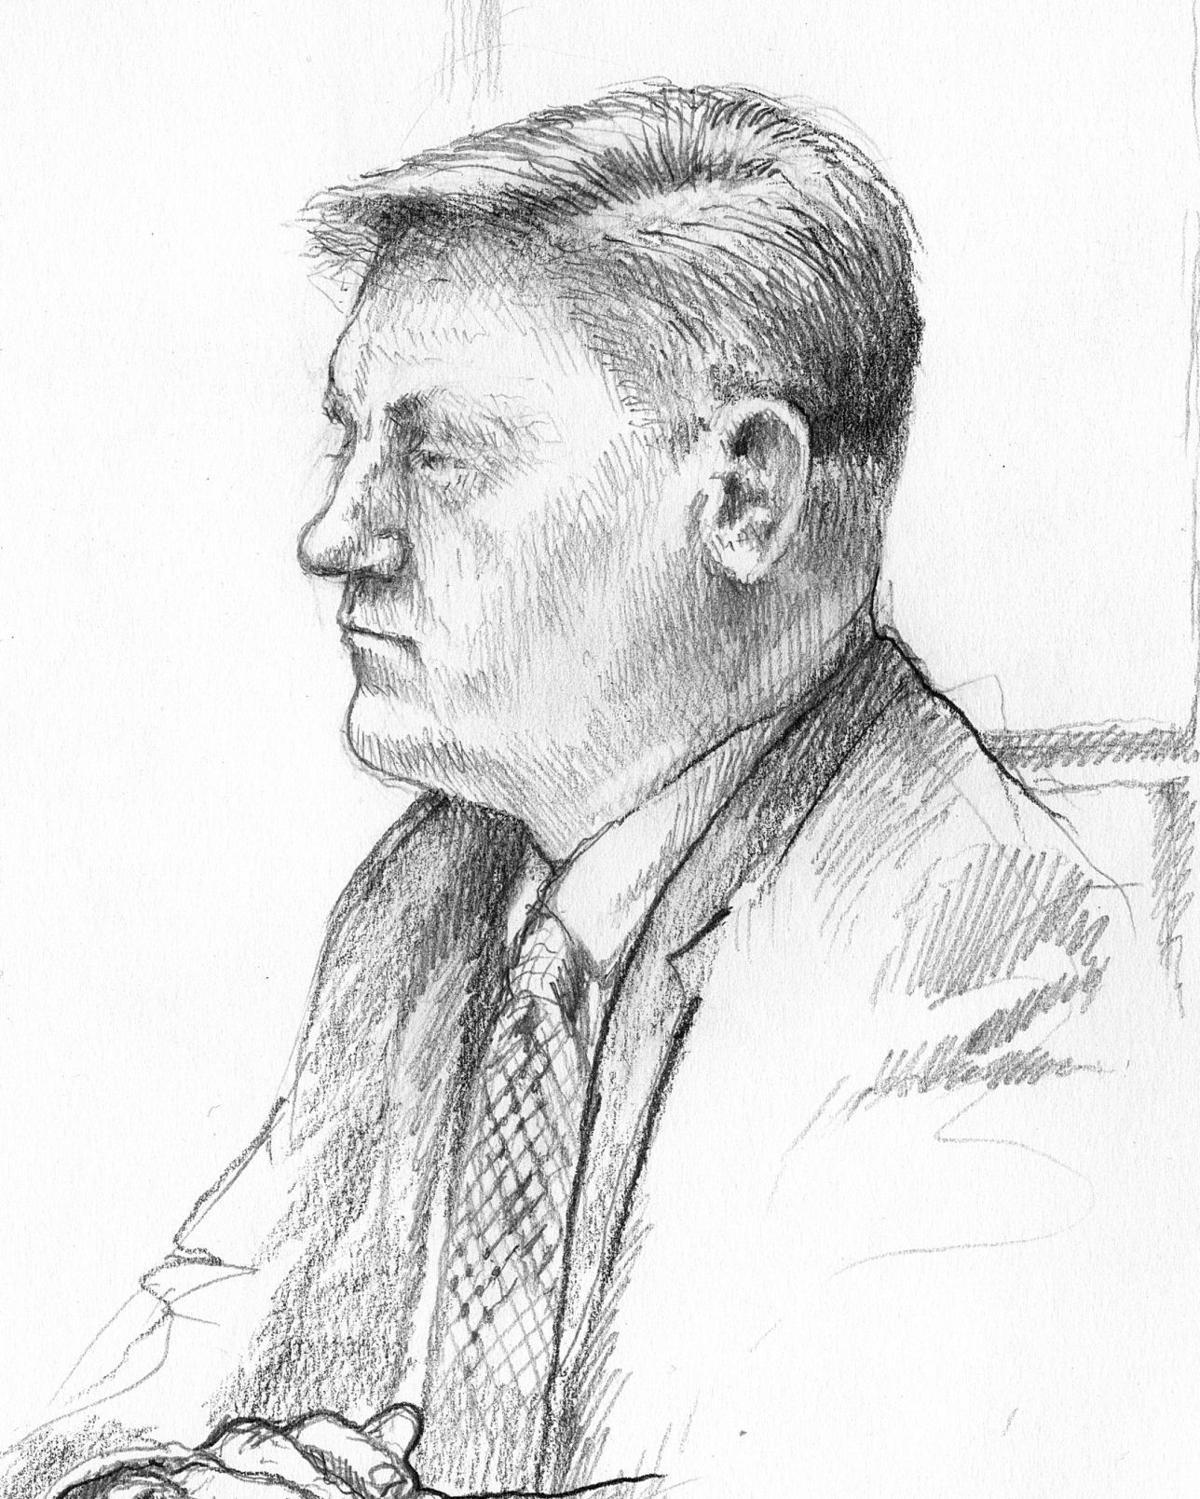 Sketch of Lonnie Swartz